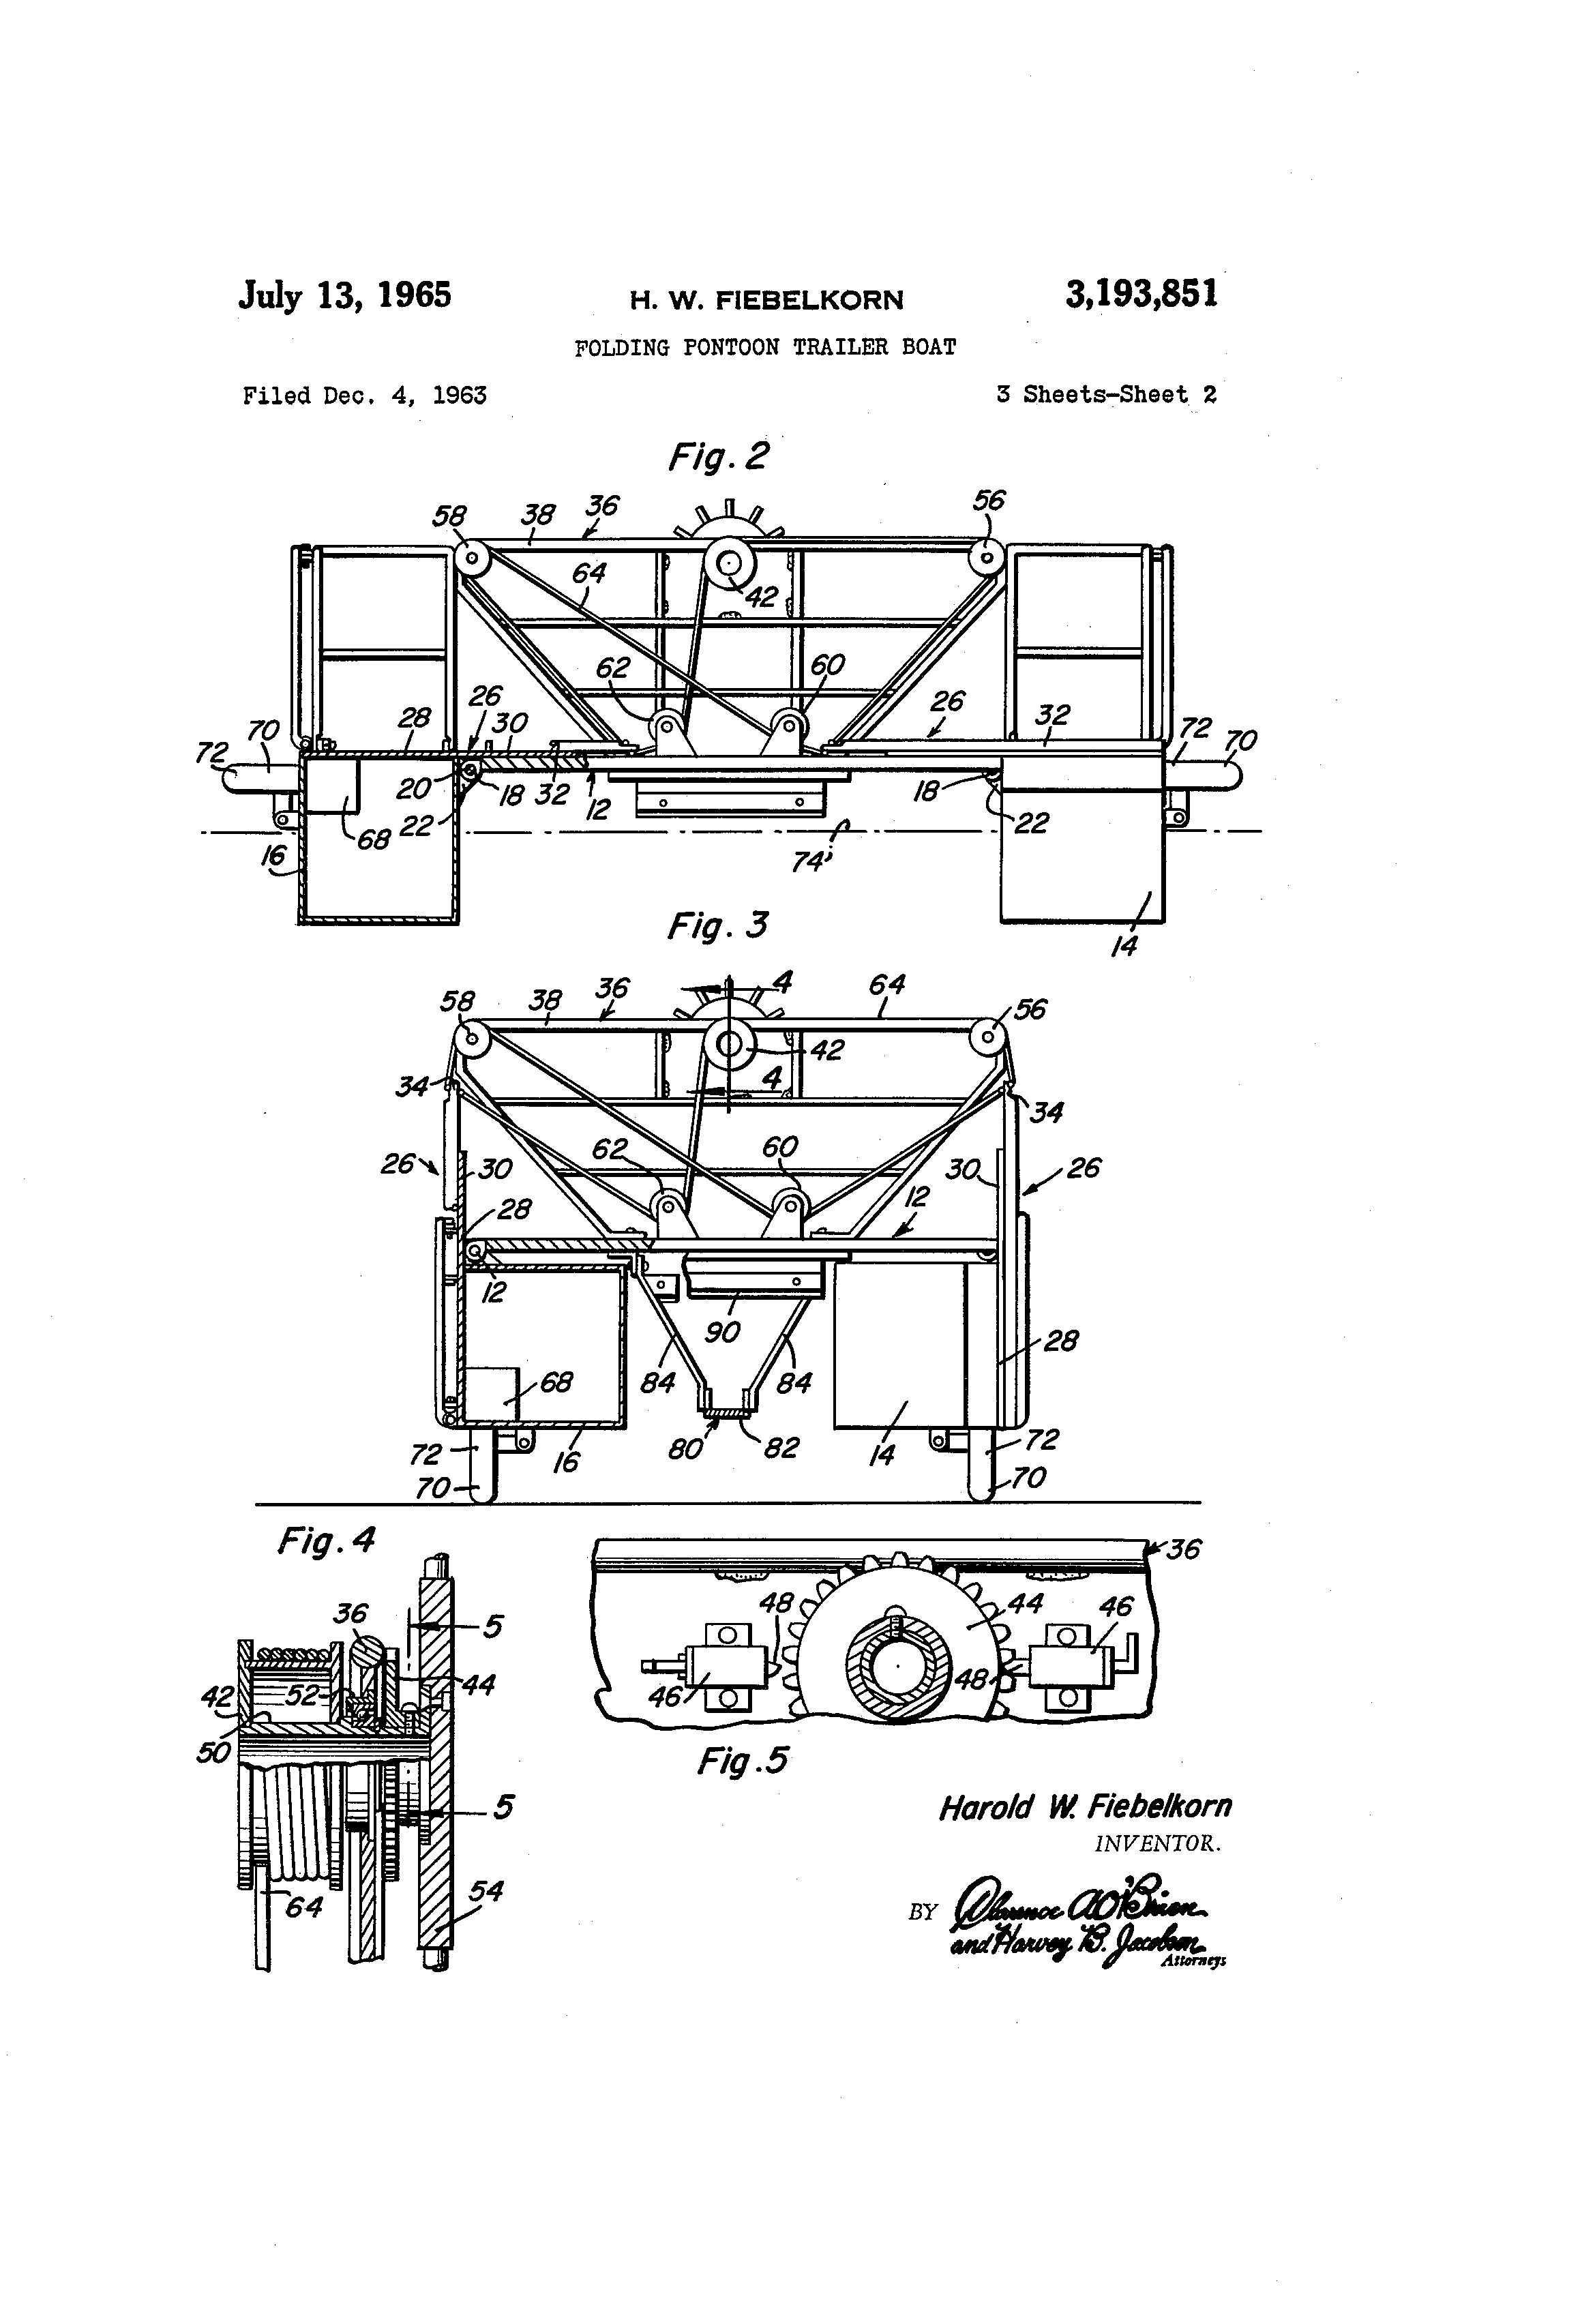 patent us3193851 - folding pontoon trailer boat